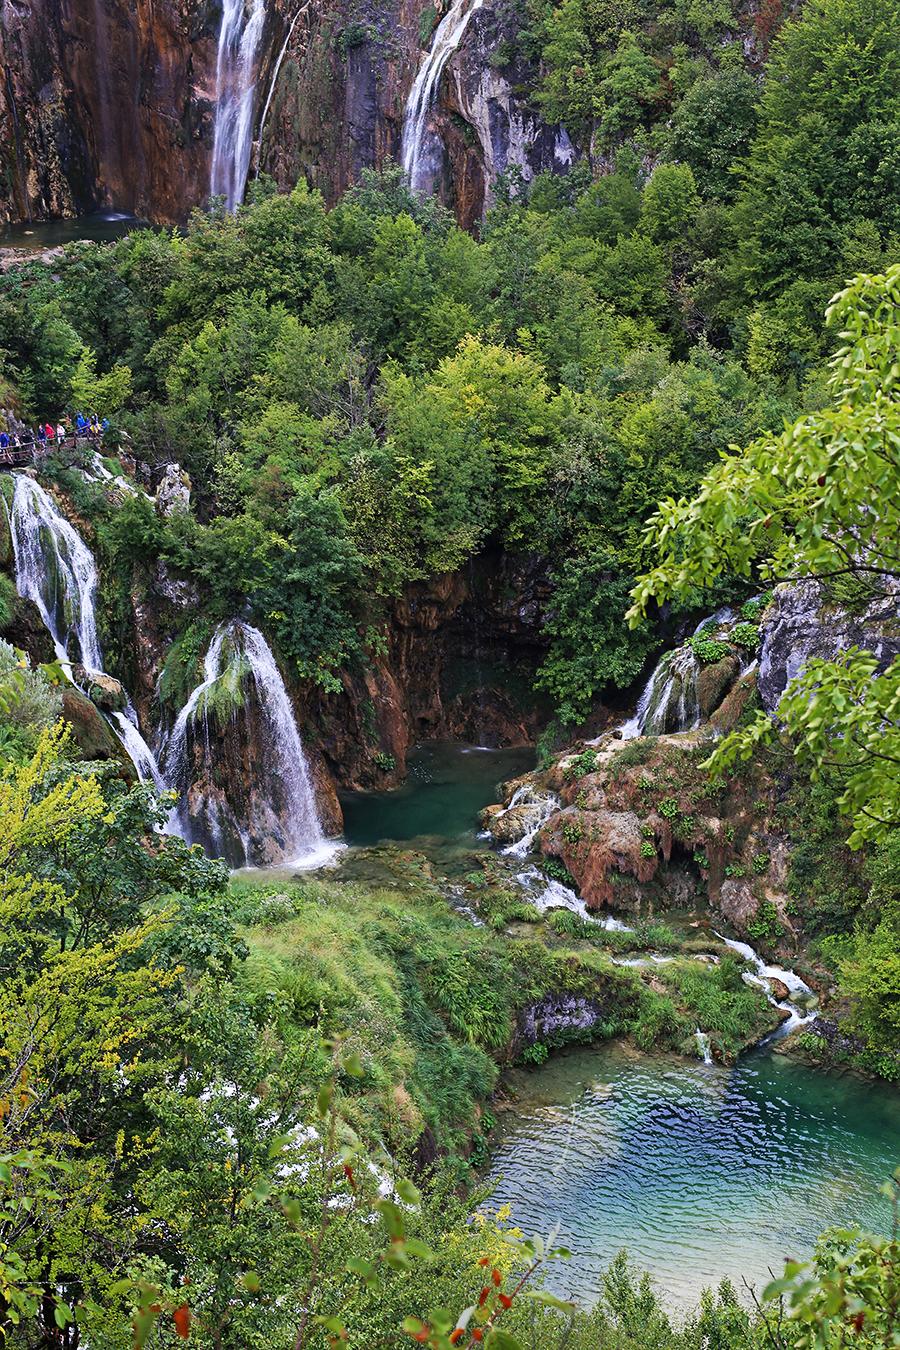 20 Days, 20 Cities, 6 Countries - Part 5: Plitvice National Park, Croatia